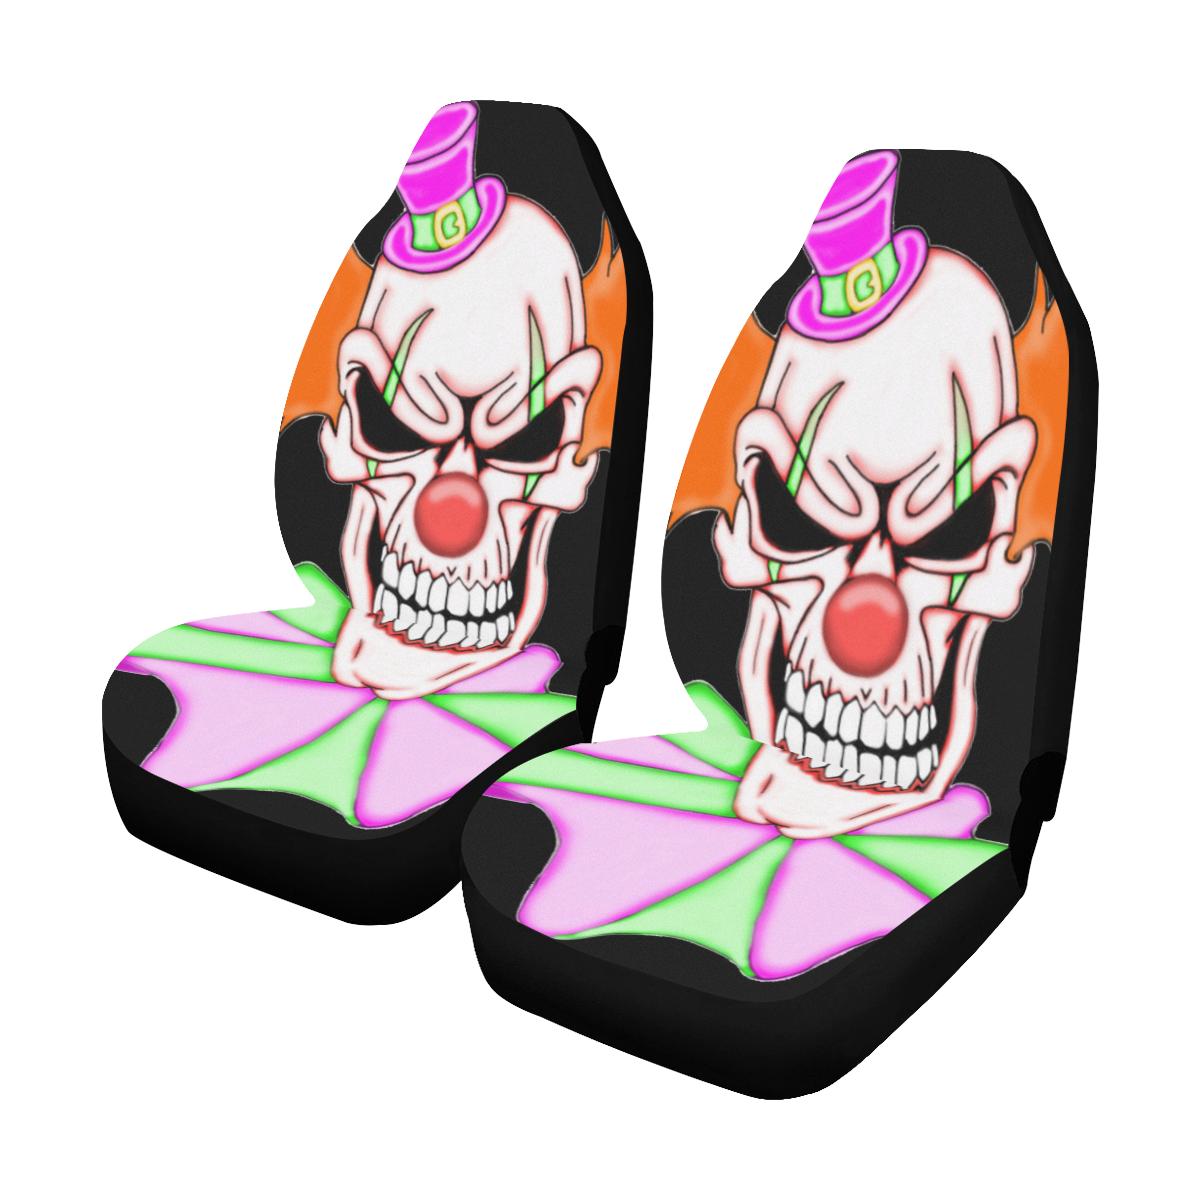 Clown Sugar Skull Car Seat Covers Set Of 2